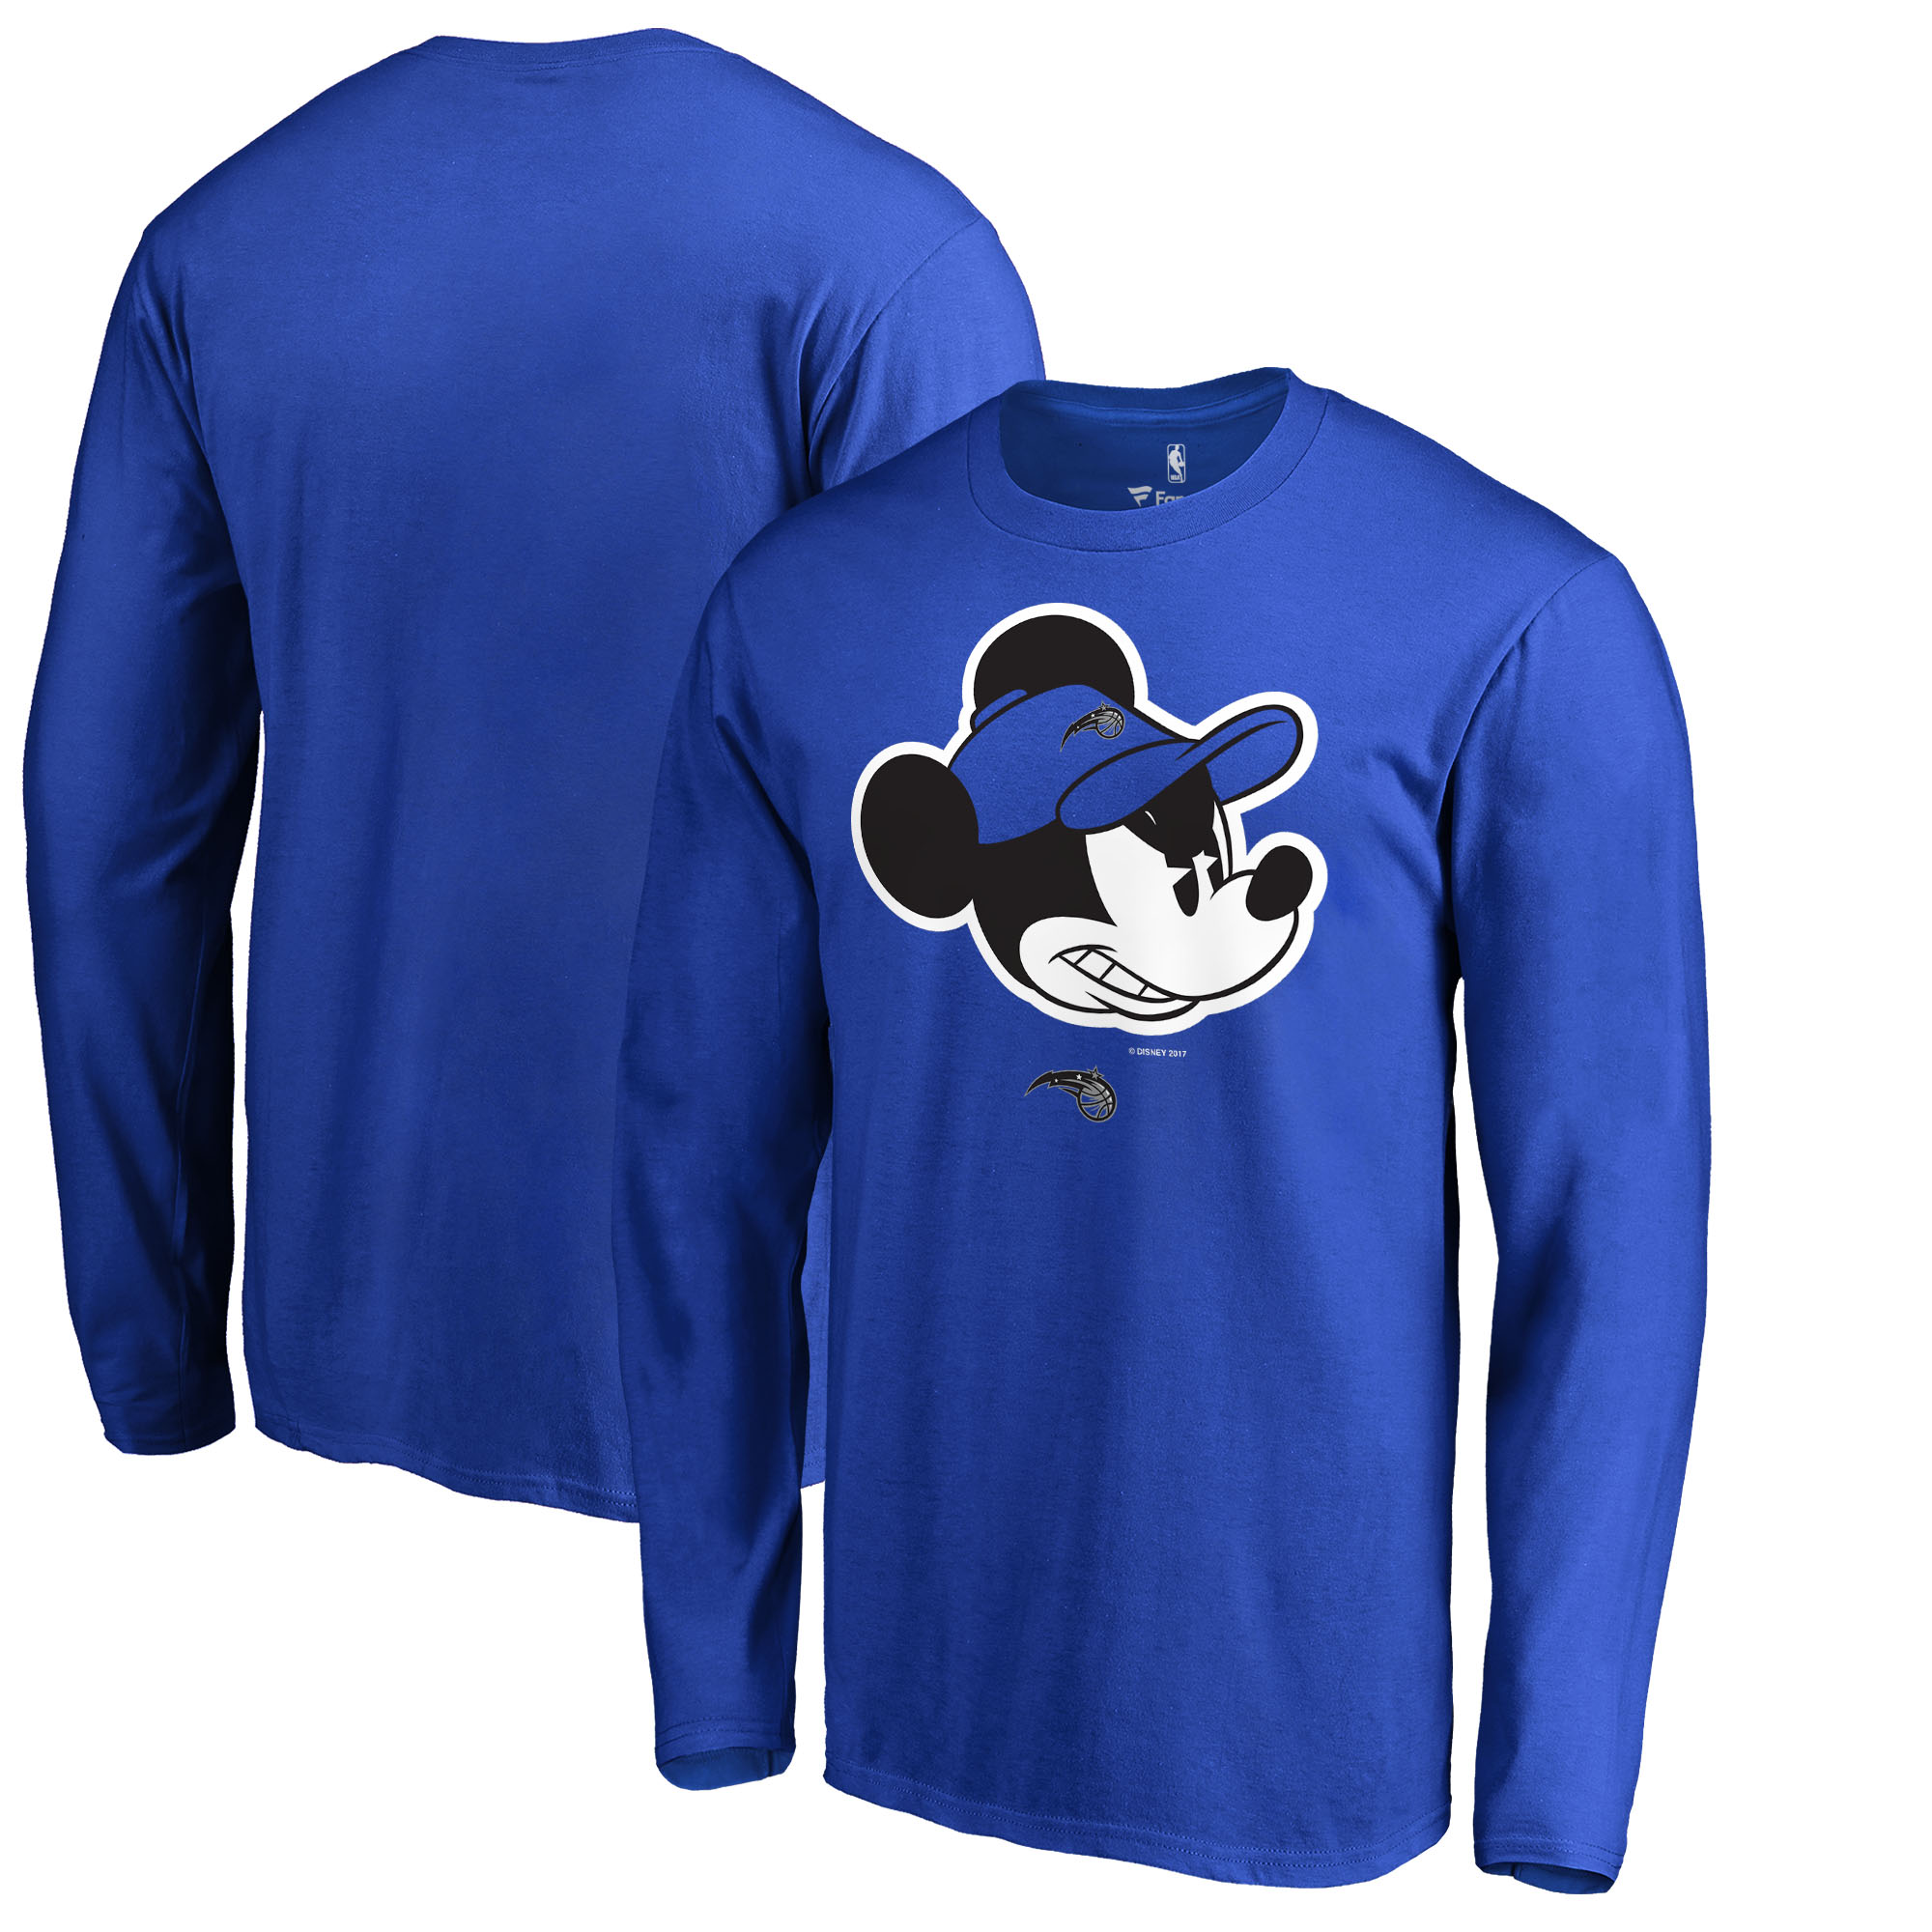 Orlando Magic Fanatics Branded Disney Game Face Long Sleeve T-Shirt - Blue